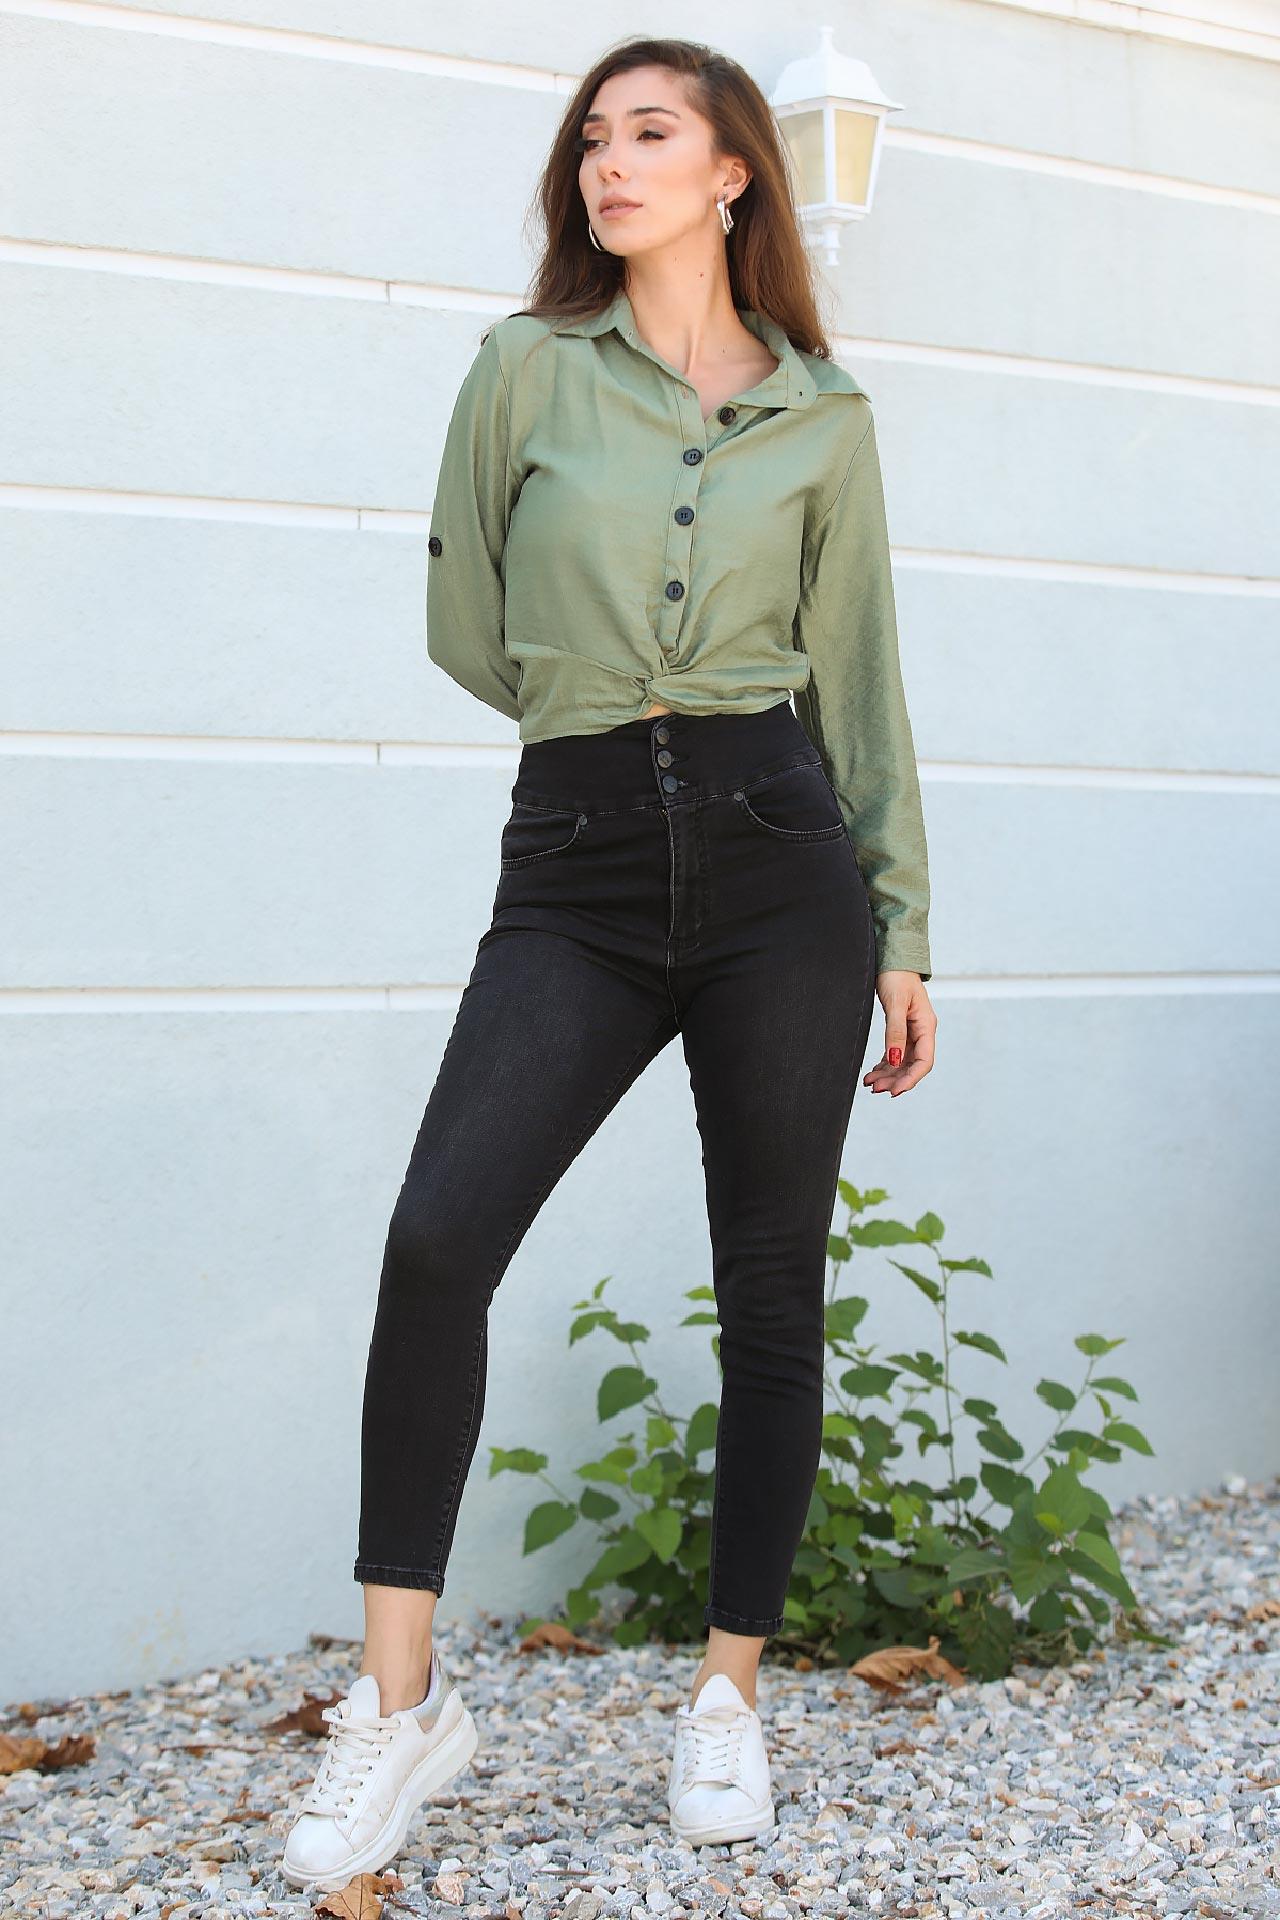 High Waist Black Skinny Jeans